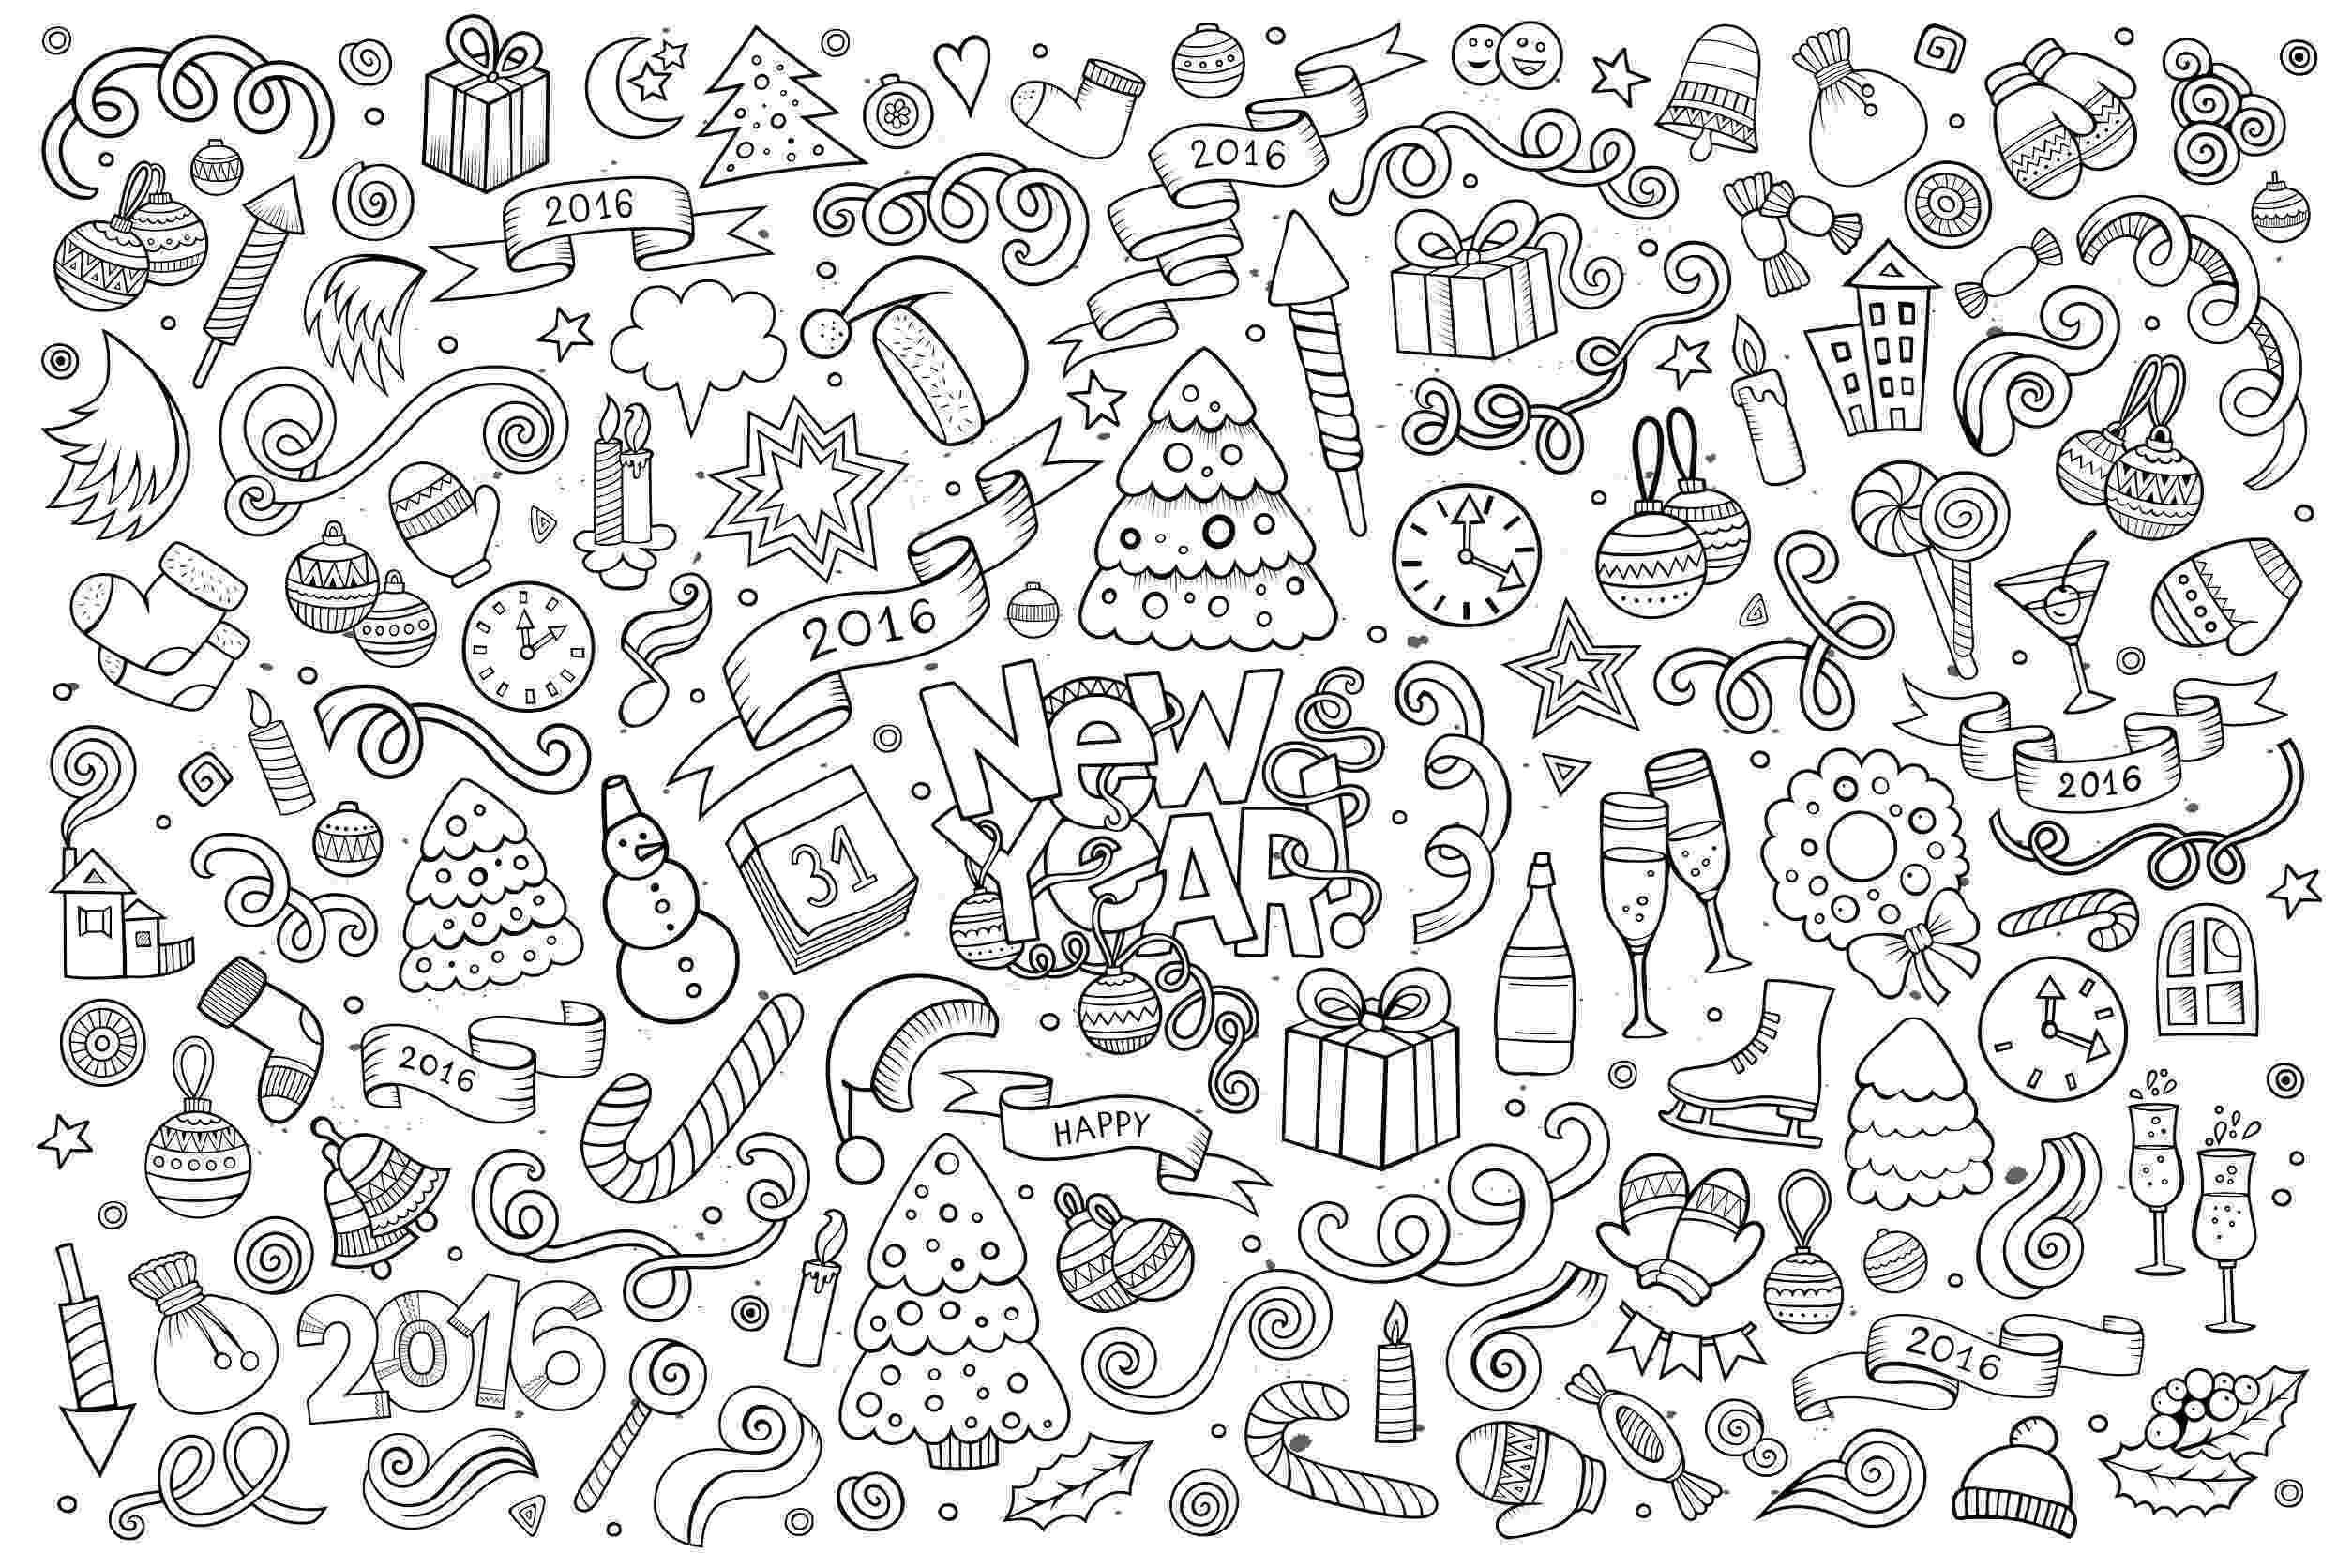 doodle art coloring book doodle art to print for free doodle art kids coloring pages doodle coloring book art